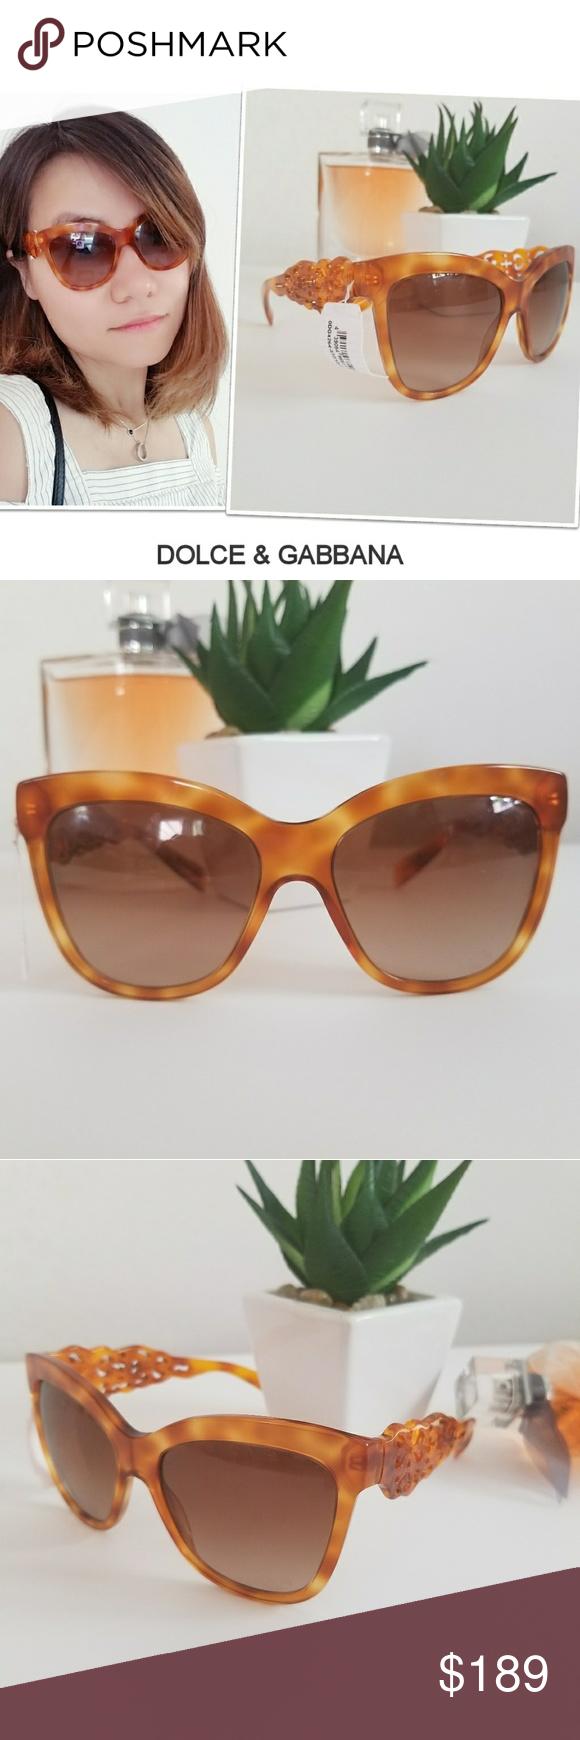 9de474ad949a Dolce   Gabbana 4264 Tortoise Leopard Sunglasses Brand new DOLCE   GABBANA  SPAIN IN SICILY COLLECTION WOMEN big square cat eye sunglasses in tortoise  brown ...